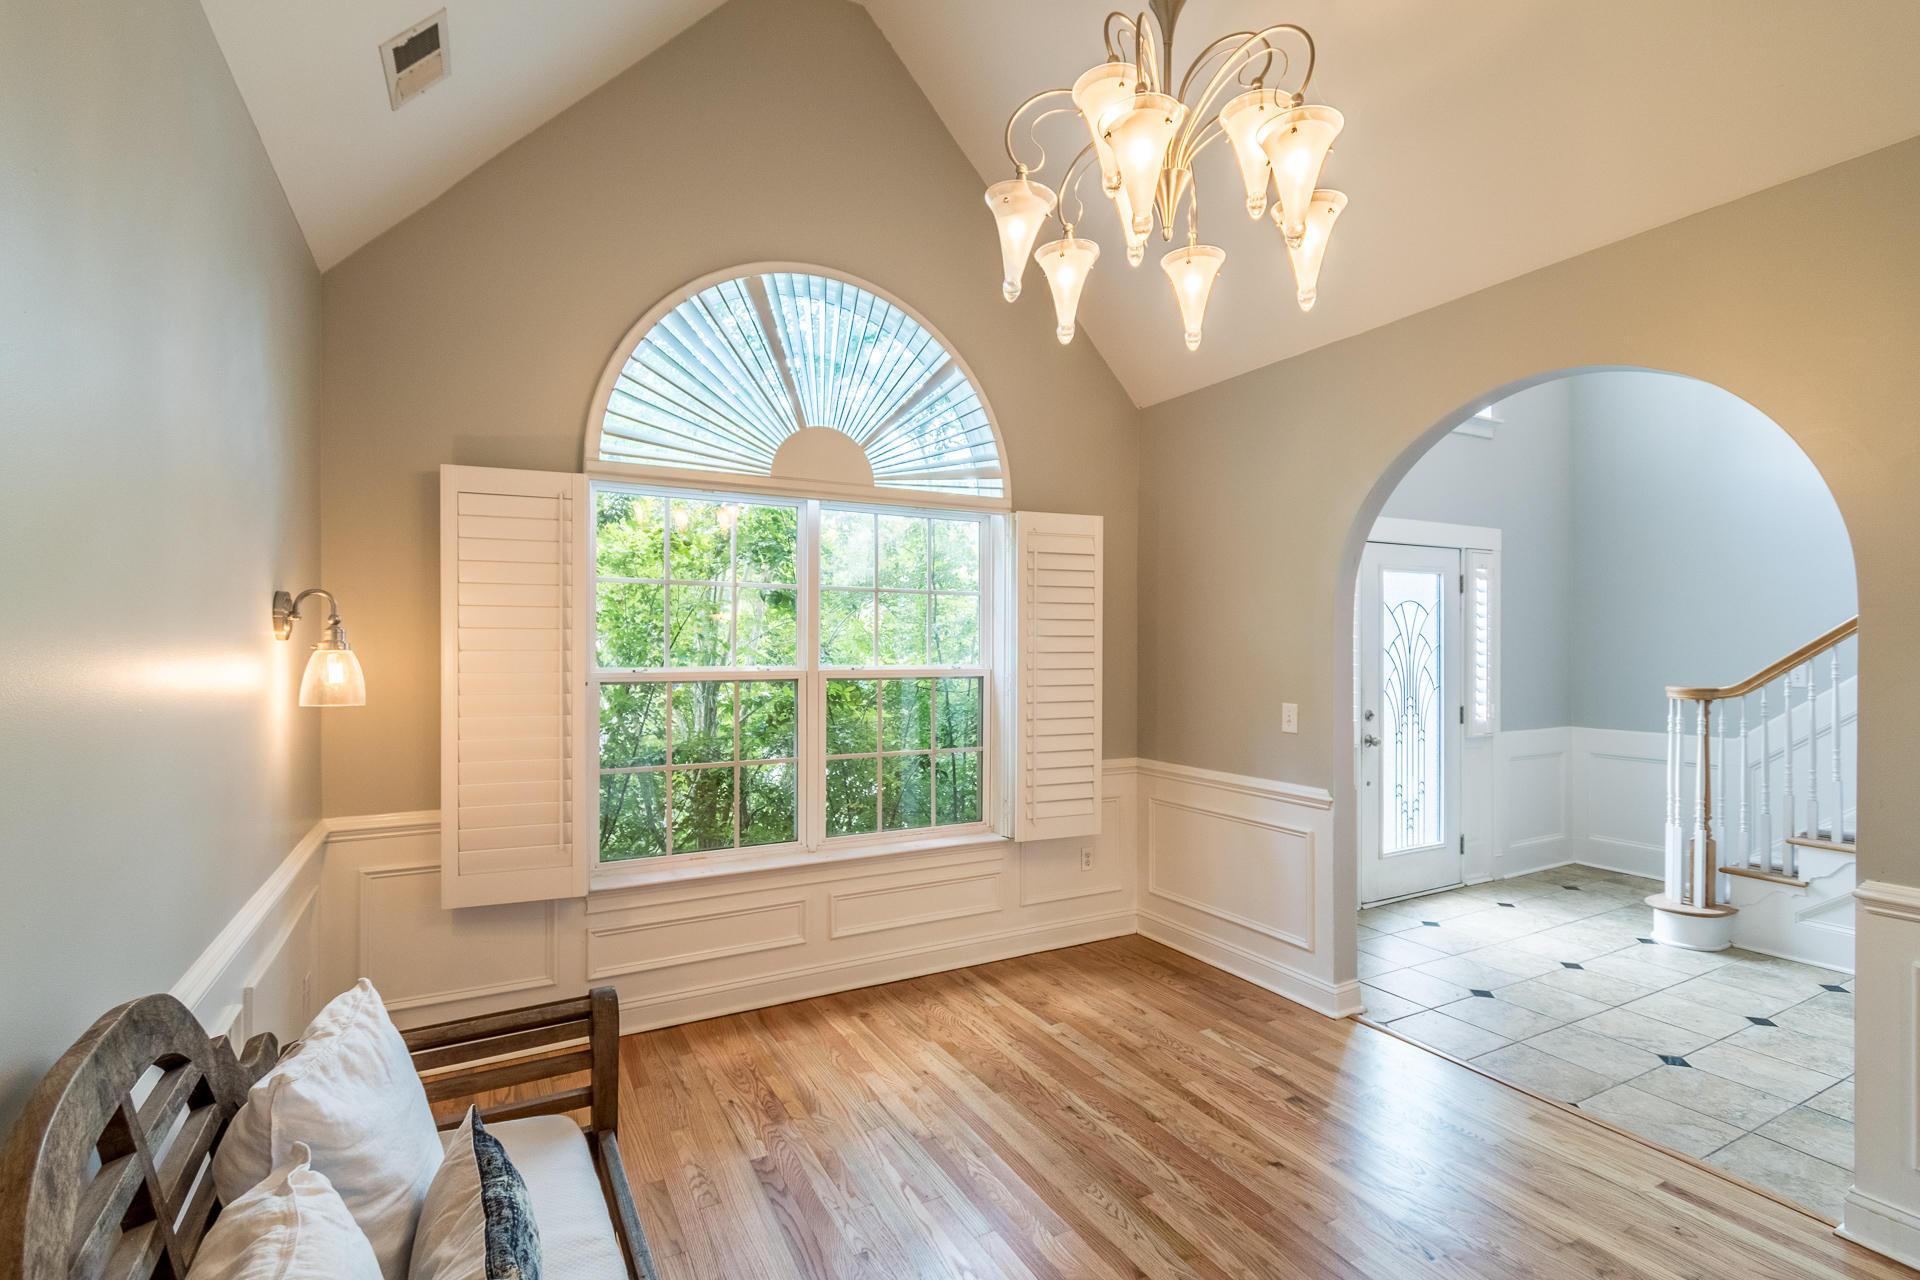 Stoneboro Shores Homes For Sale - 656 Stoneboro, Charleston, SC - 22